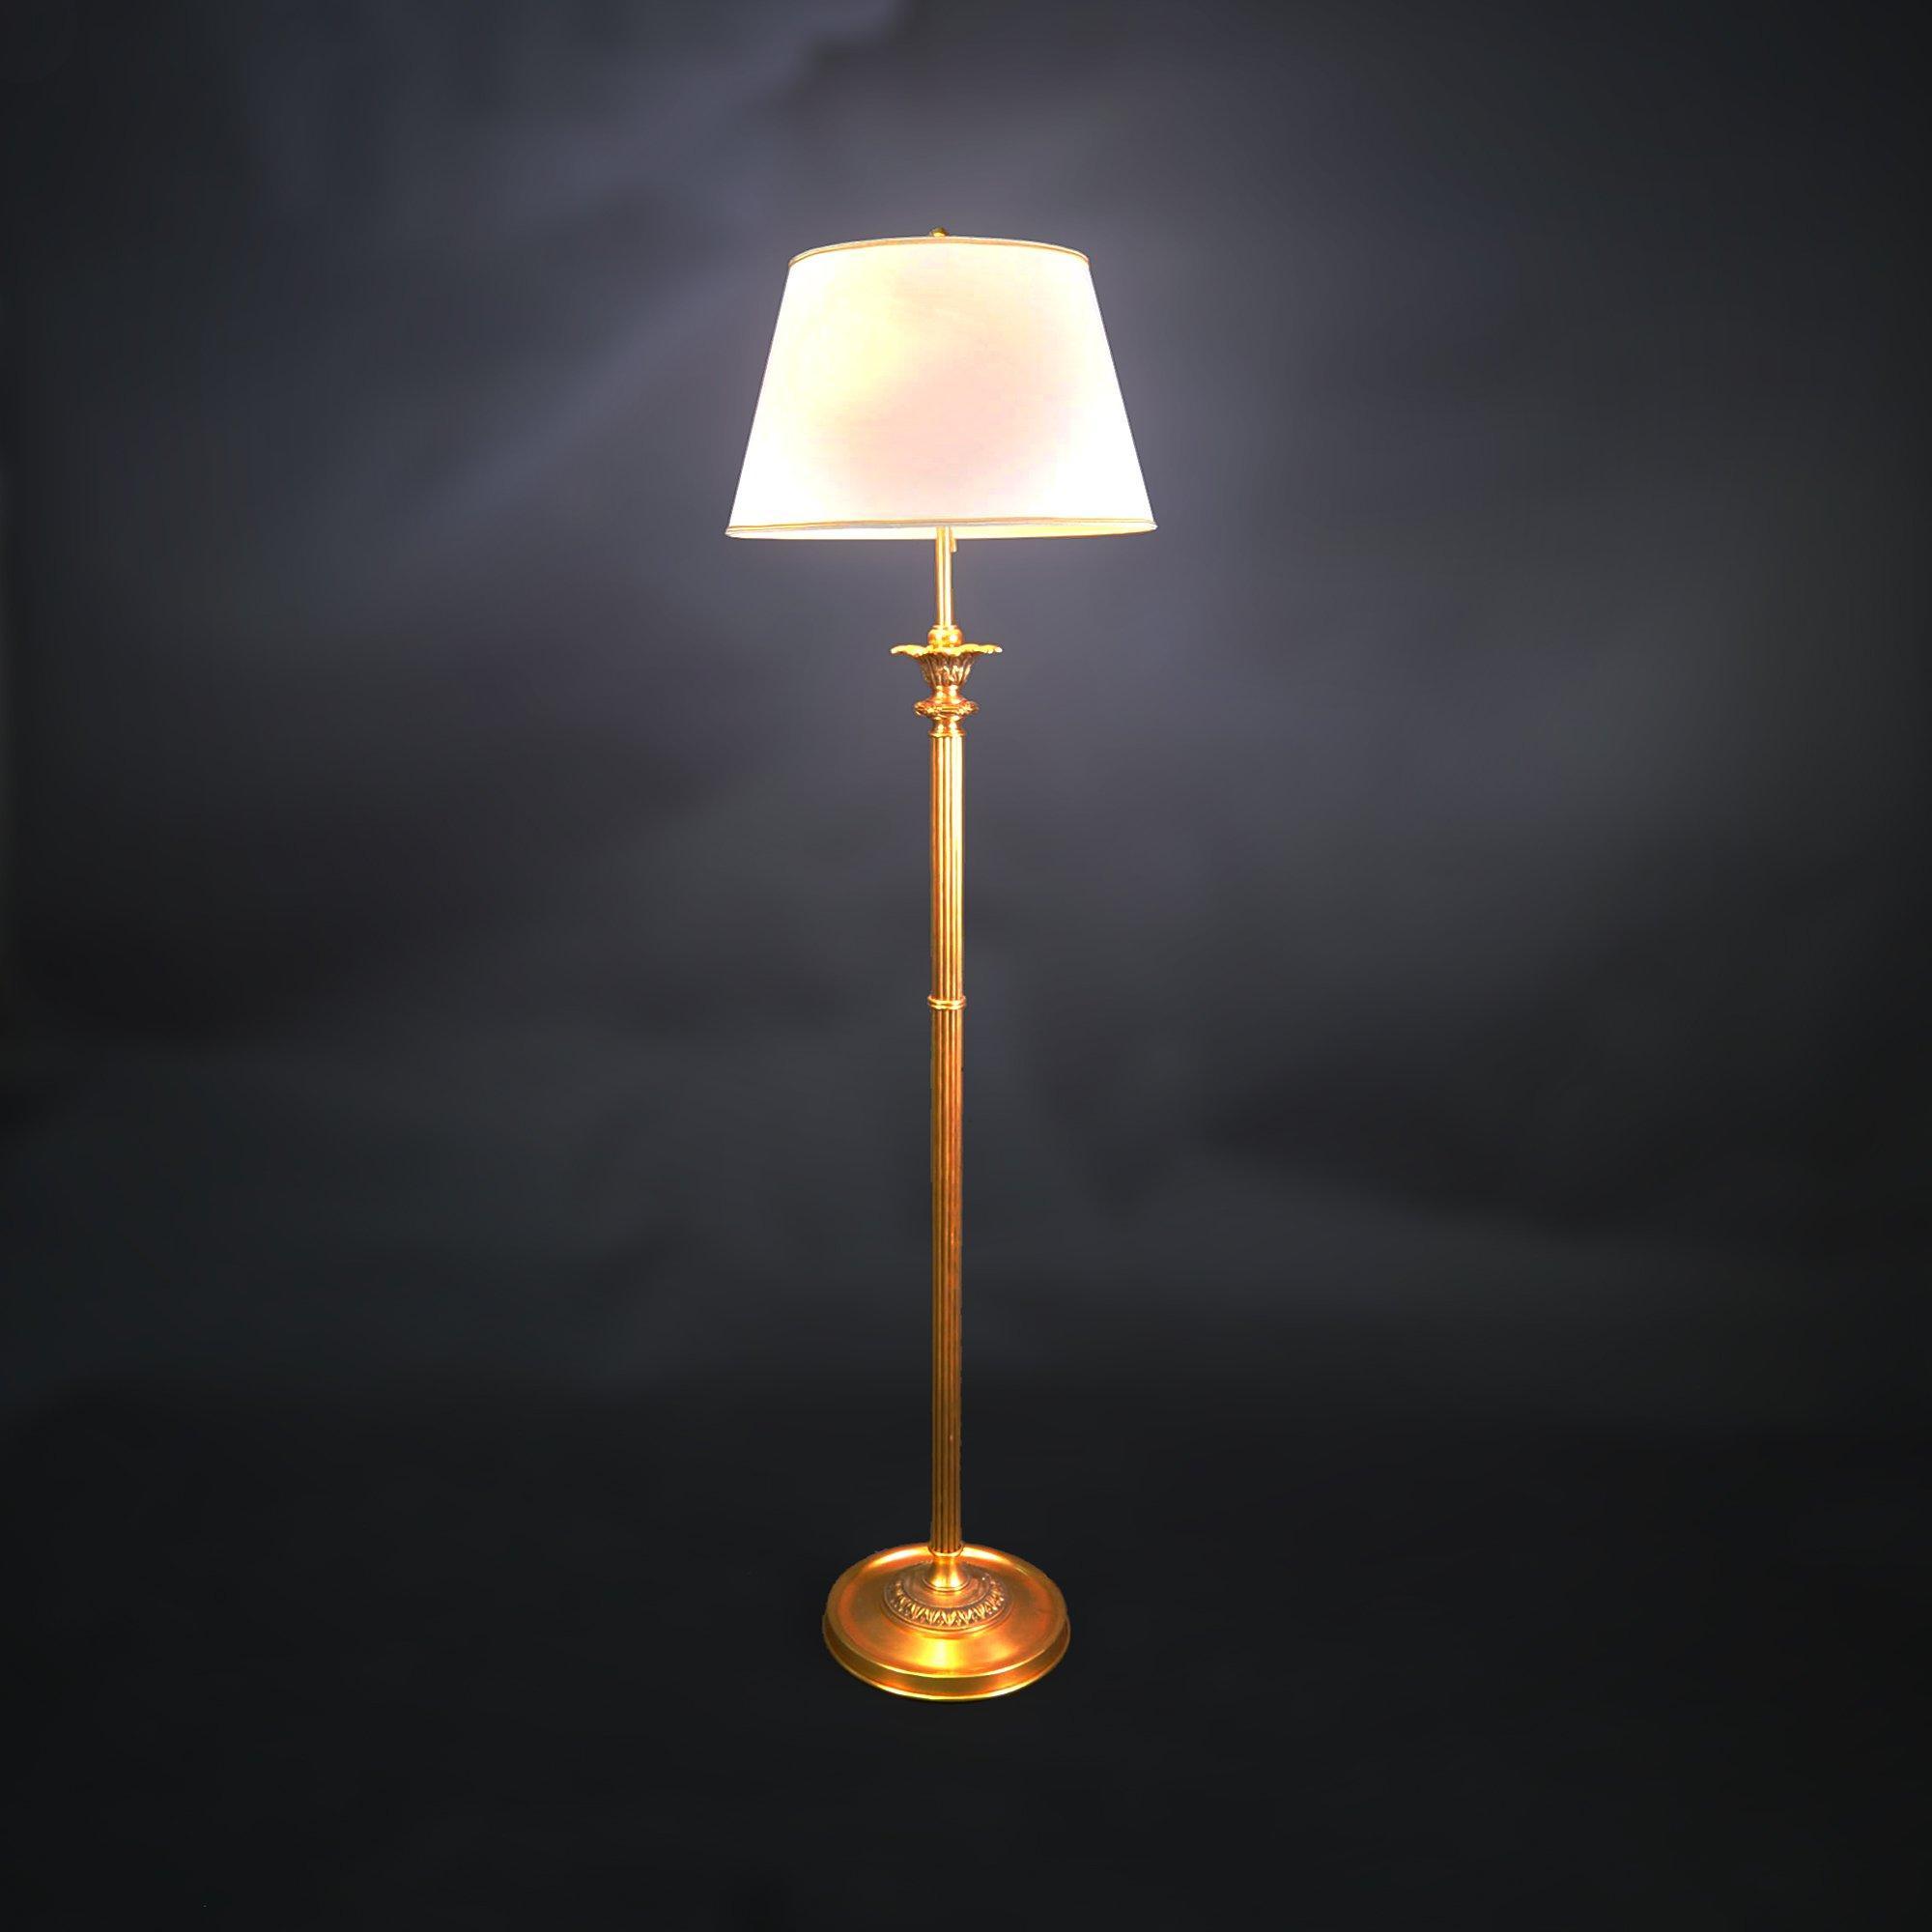 Balzac floor lamp